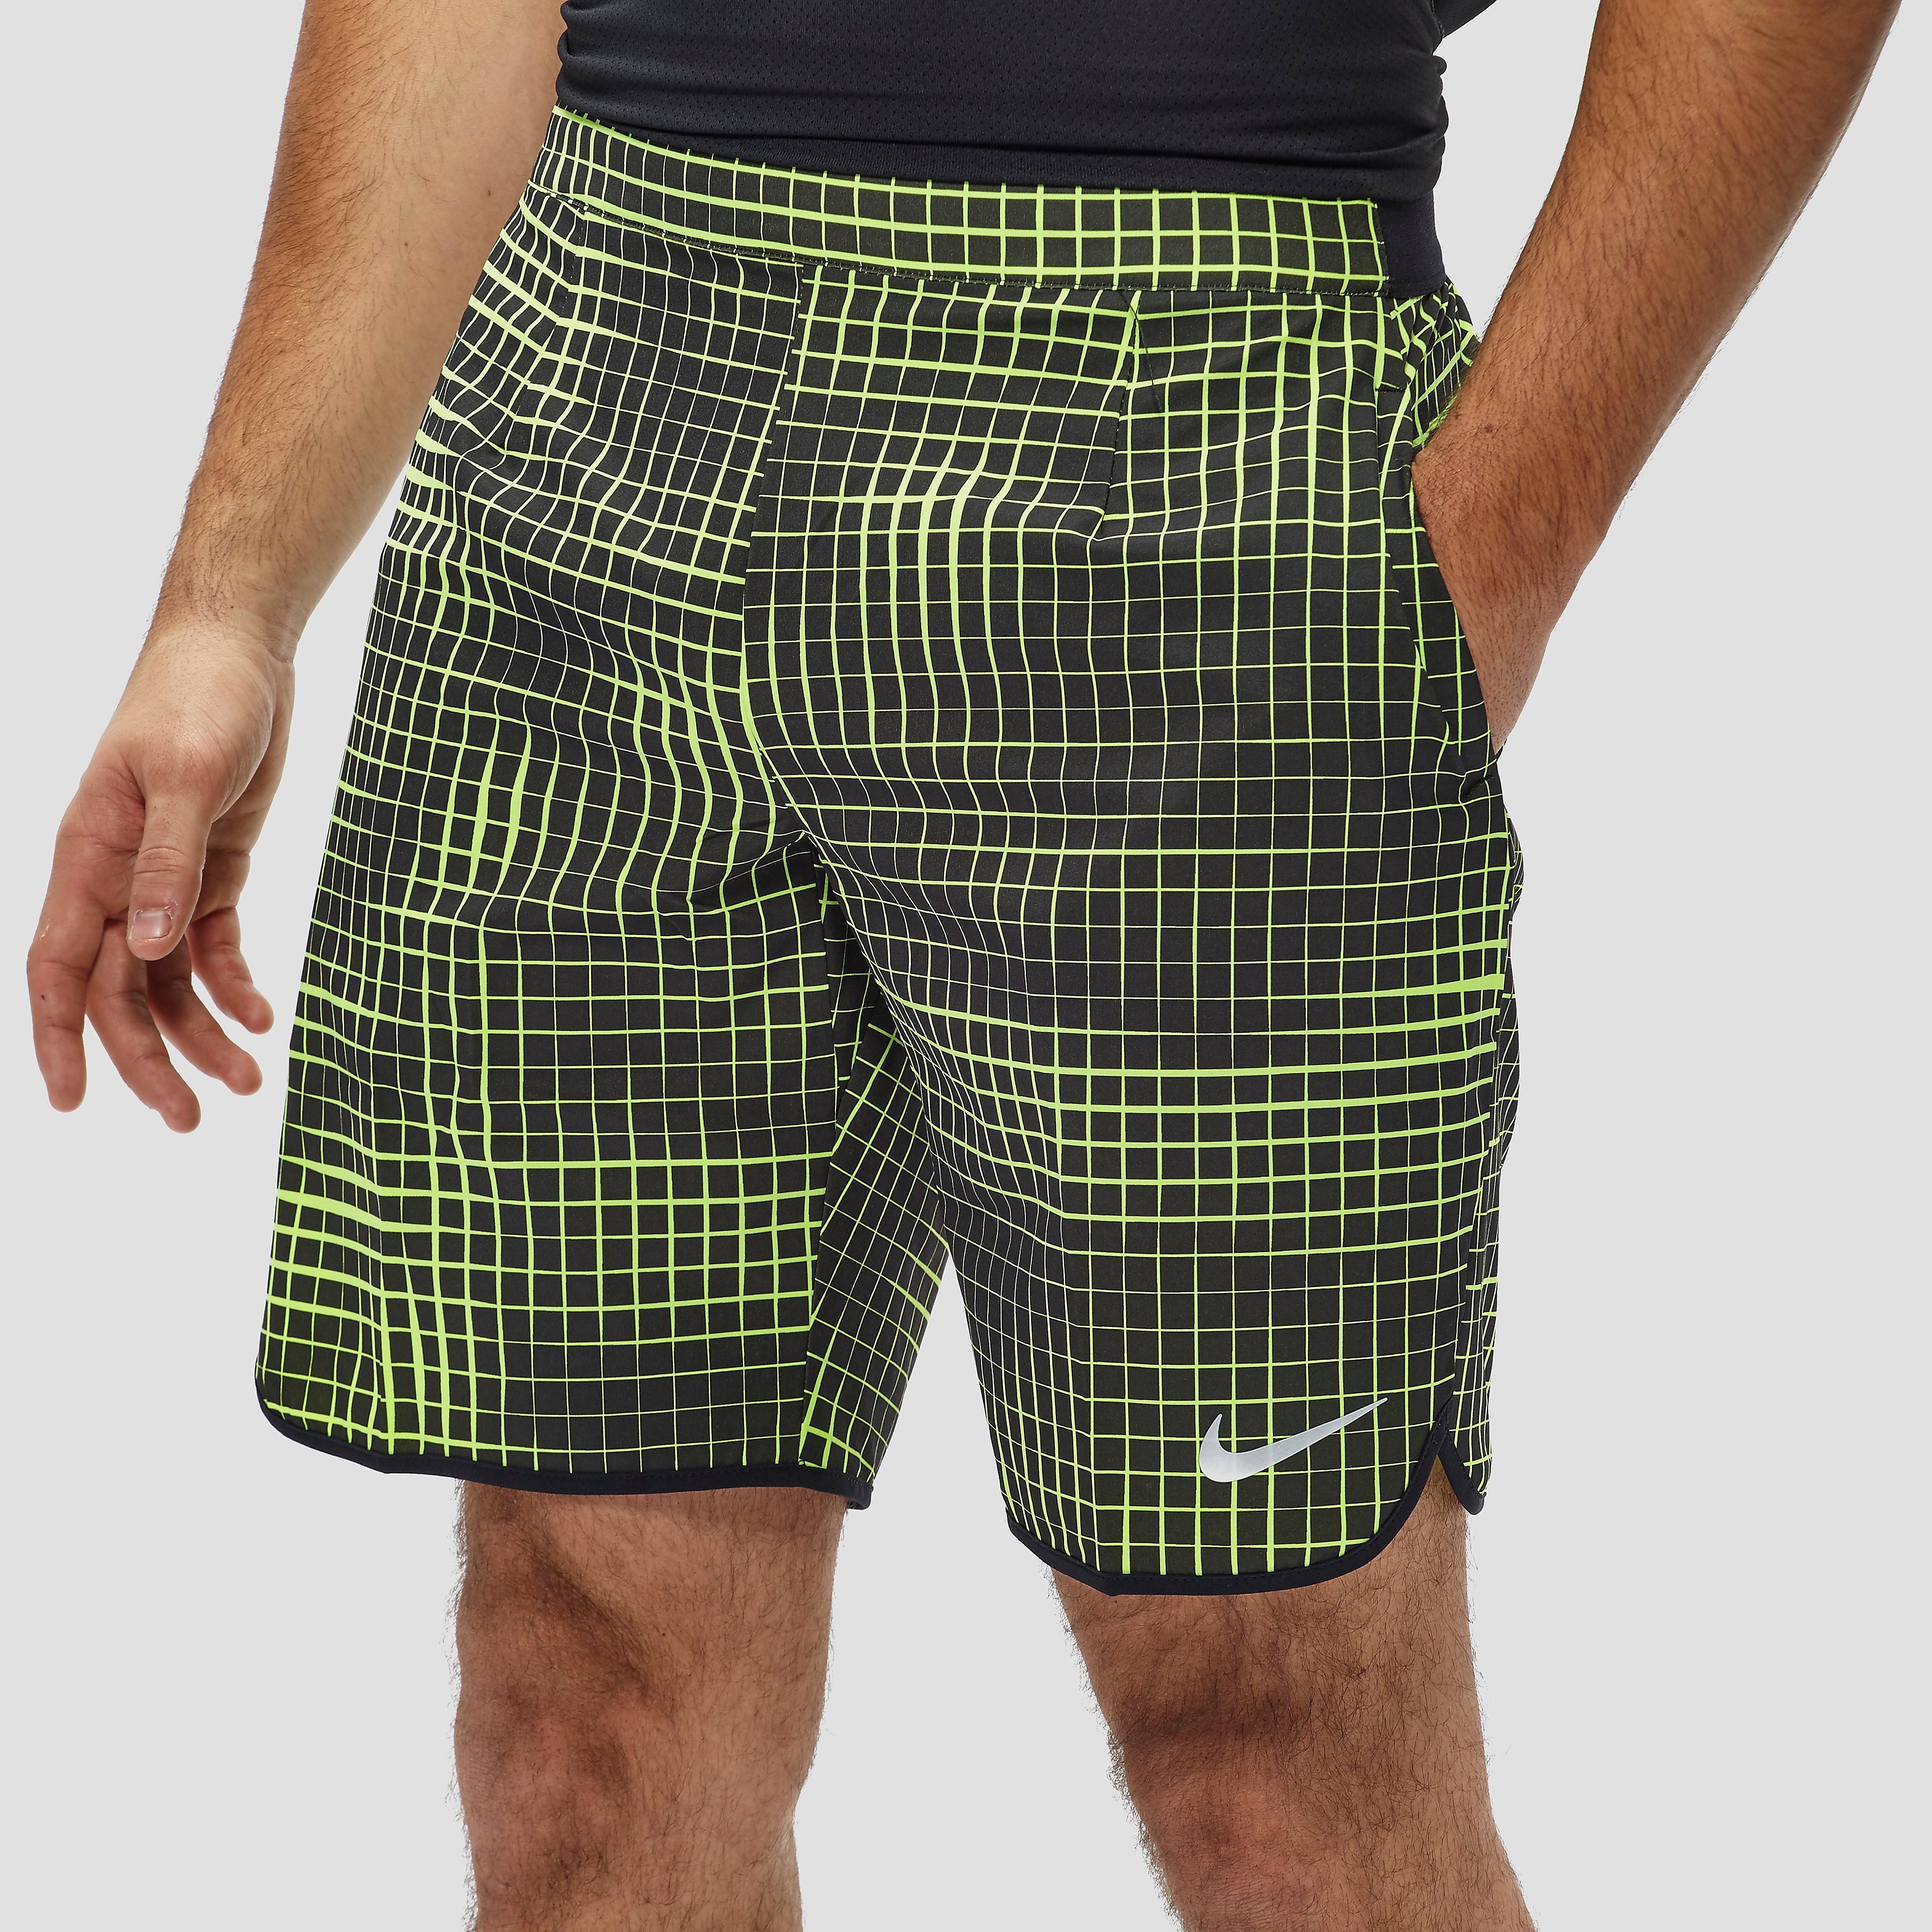 Nike Court Gladiator Men's Shorts